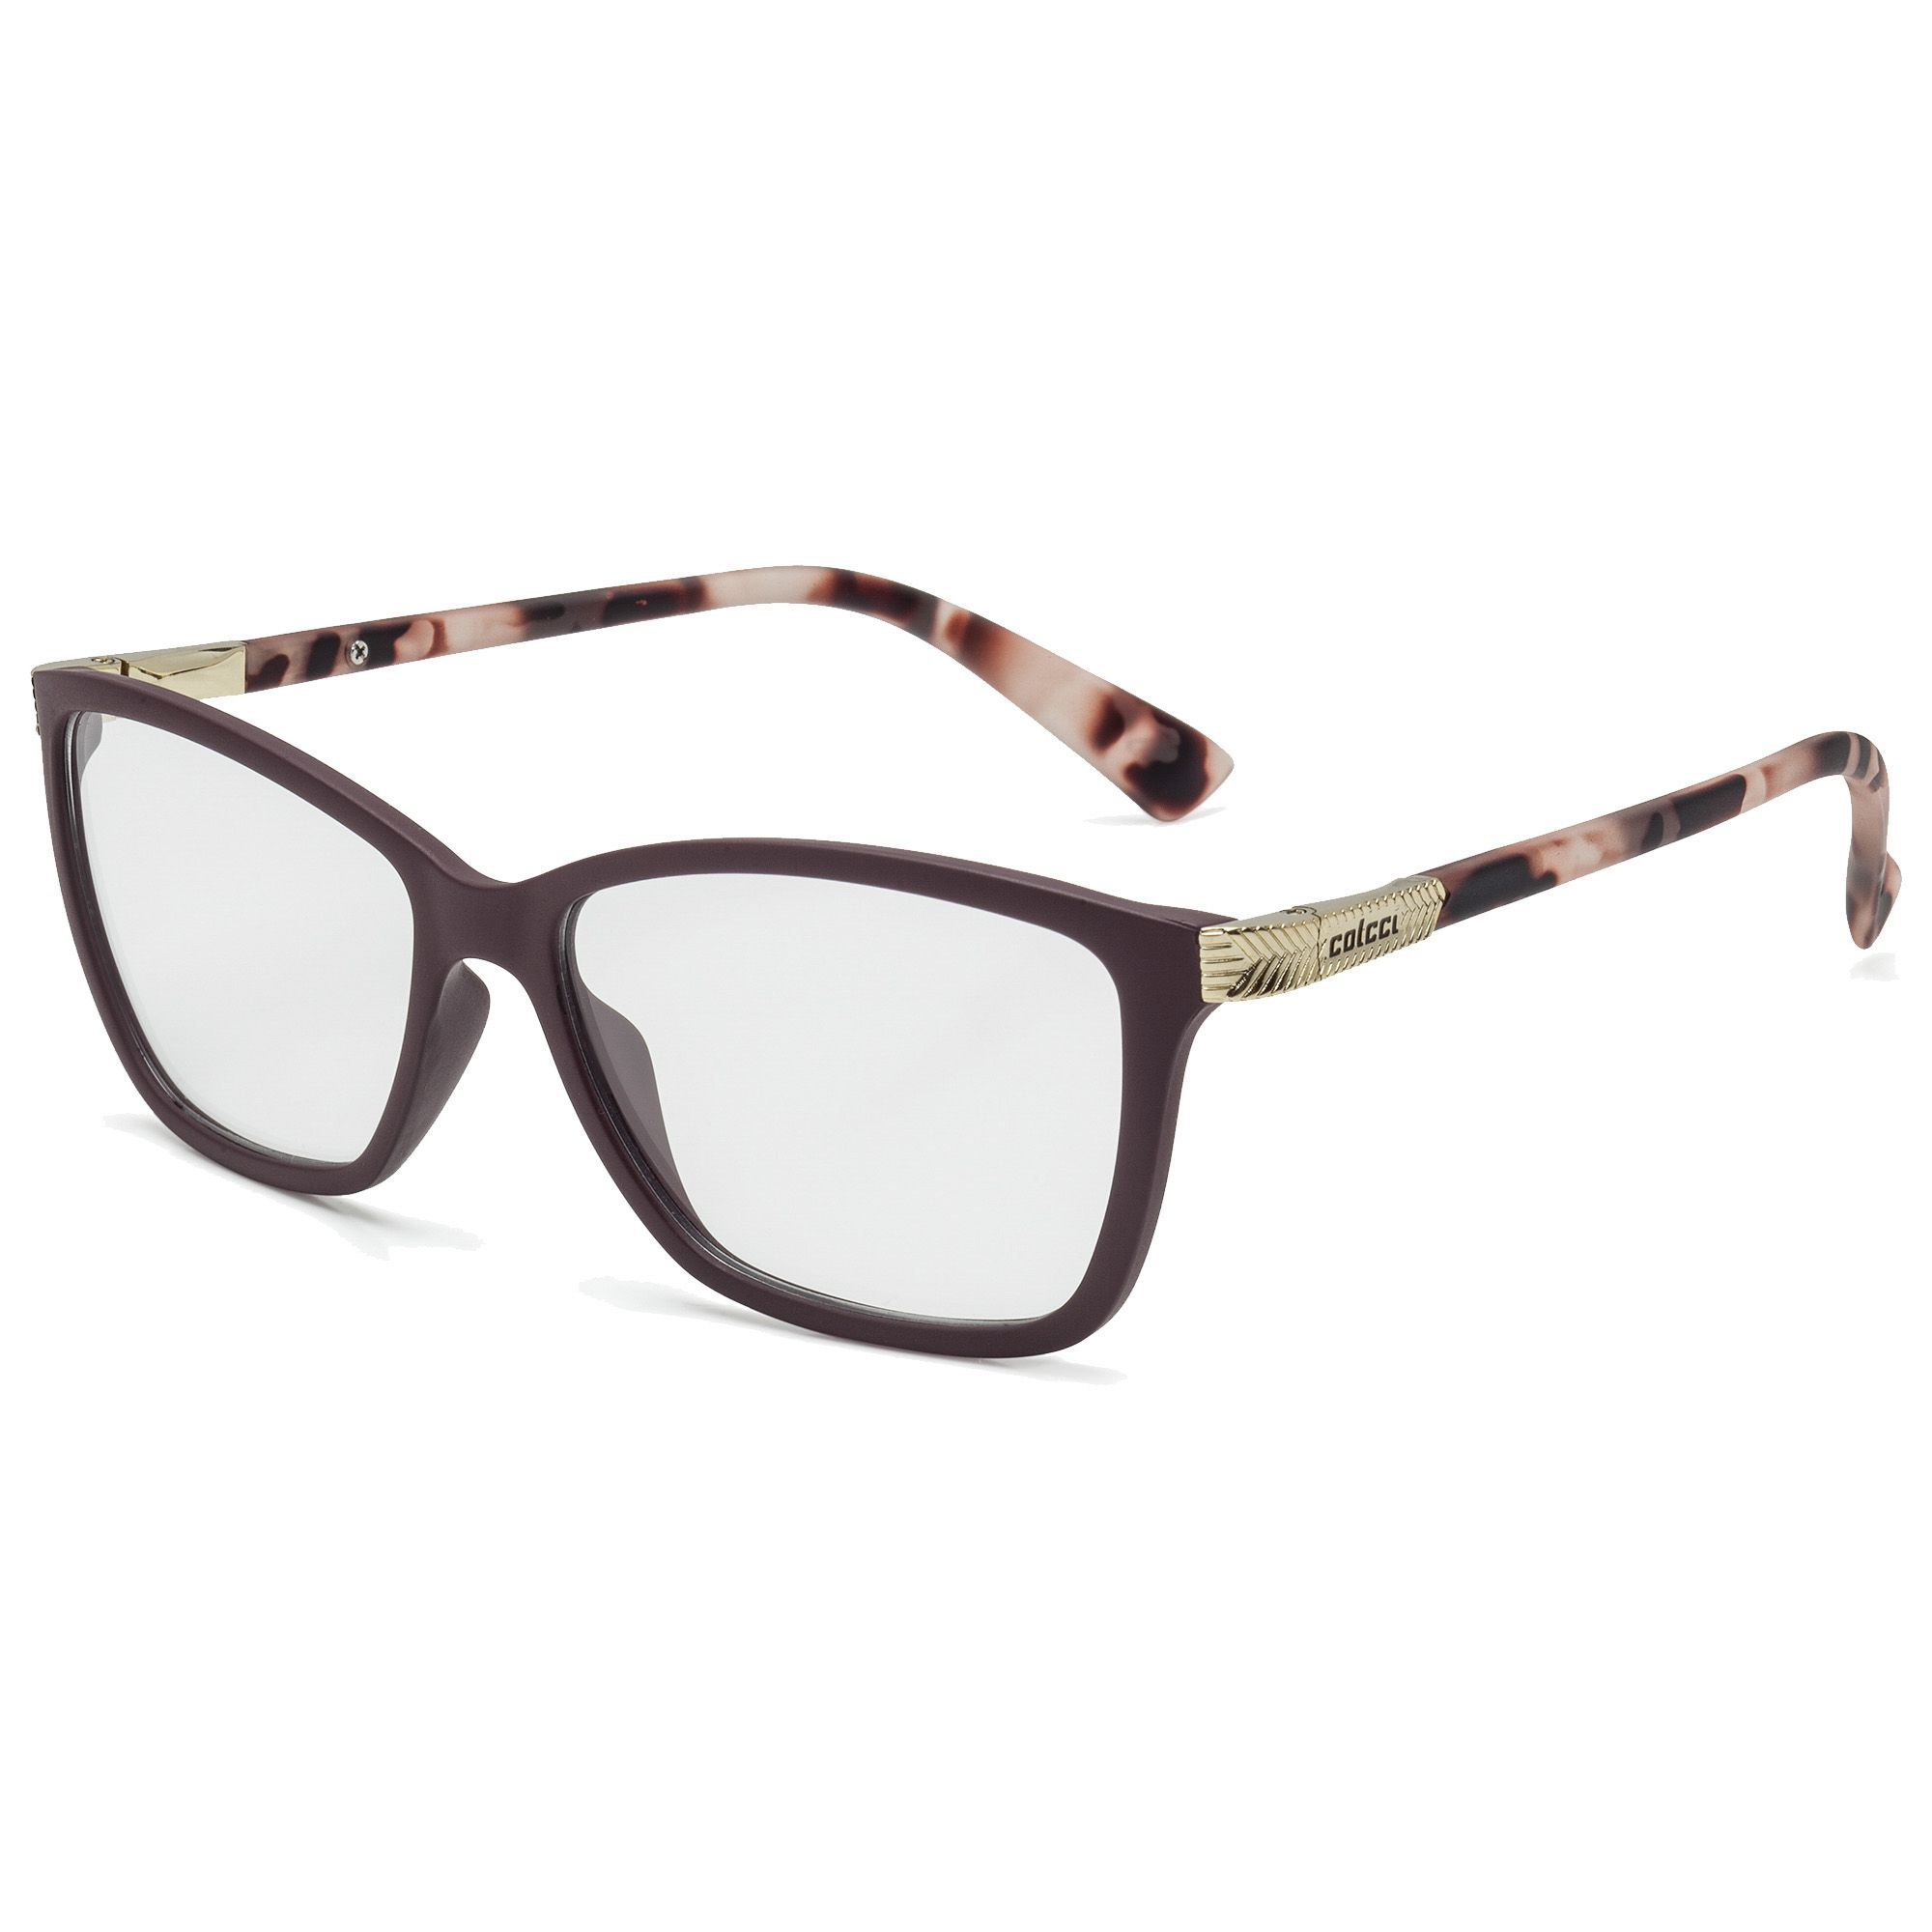 Óculos de Grau Feminino Colcci Patti C6079C5253